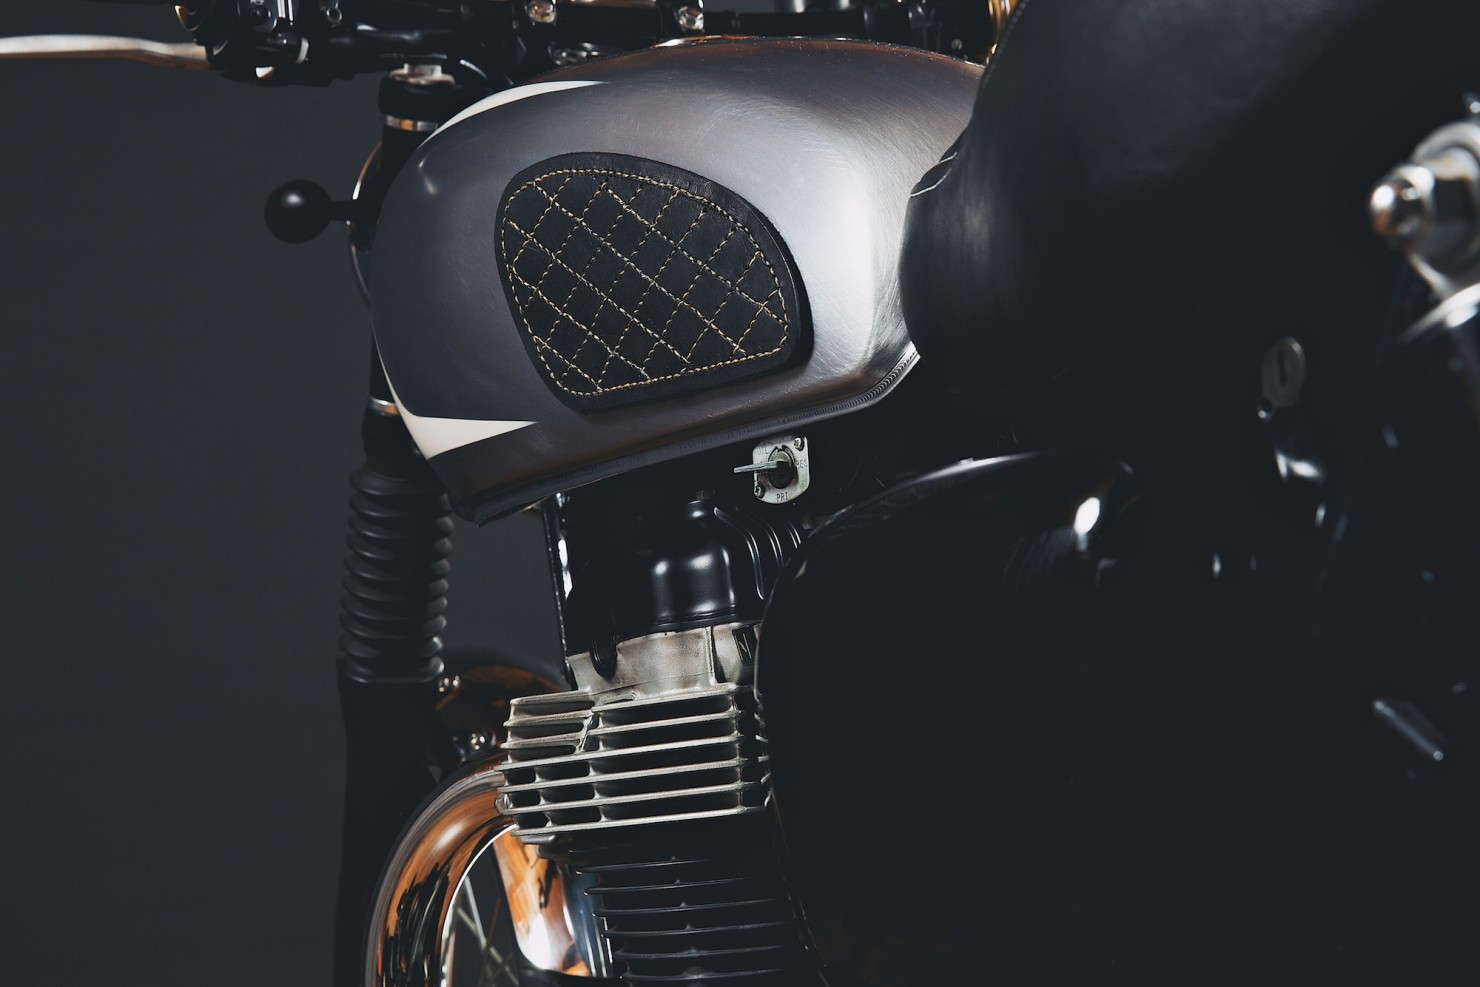 Kawasaki W650 Motorcycle 16 1480x987 Kawasaki W650